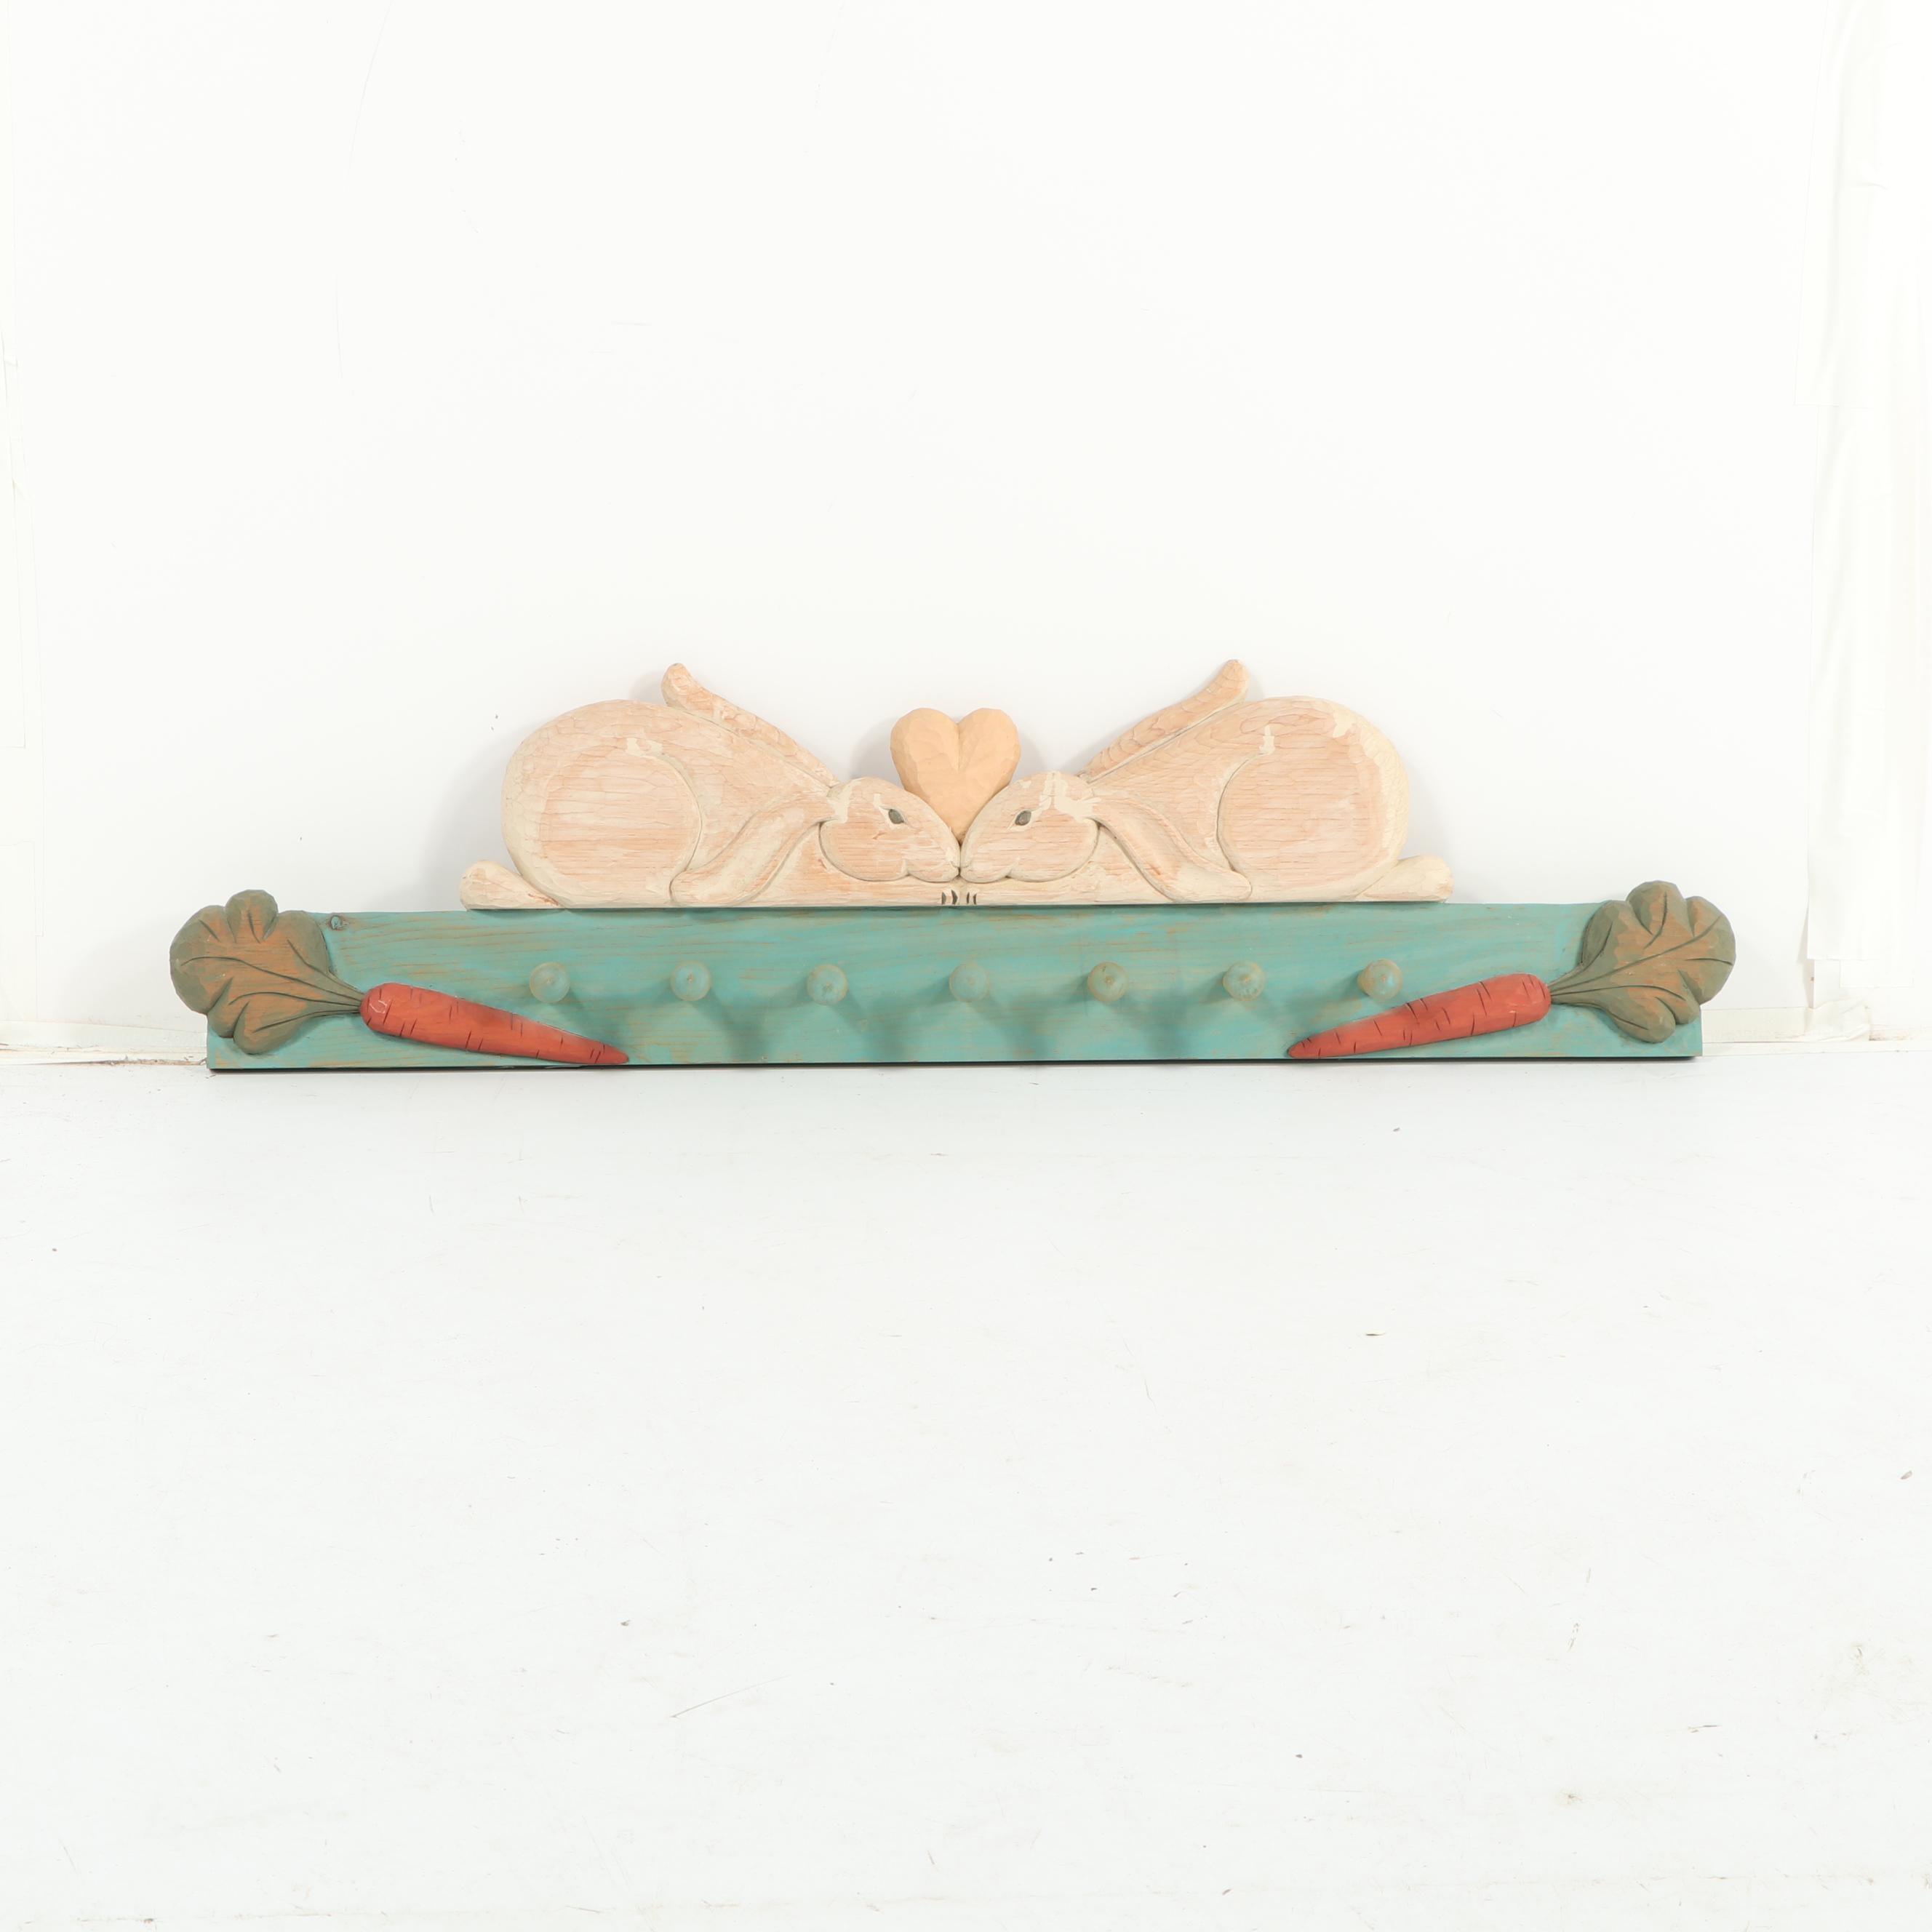 Raintree Carvings Carved Wood Rabbit Themed Wall Hooks